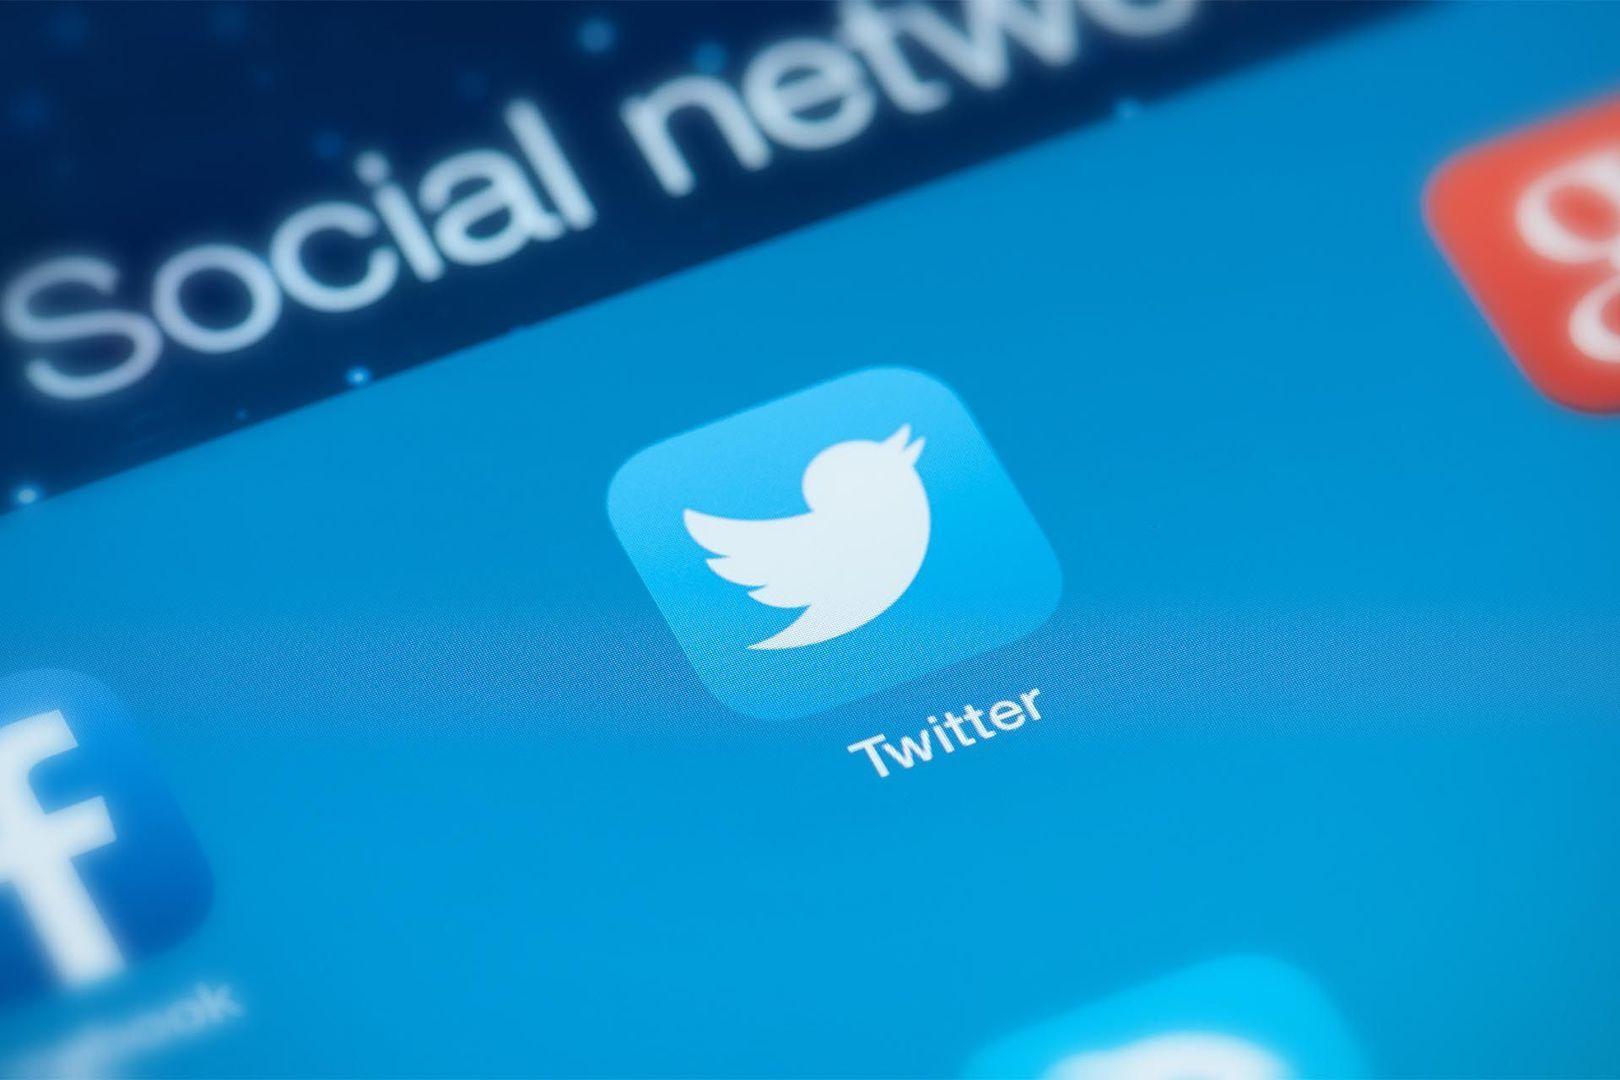 Twitter, Twitter Lite